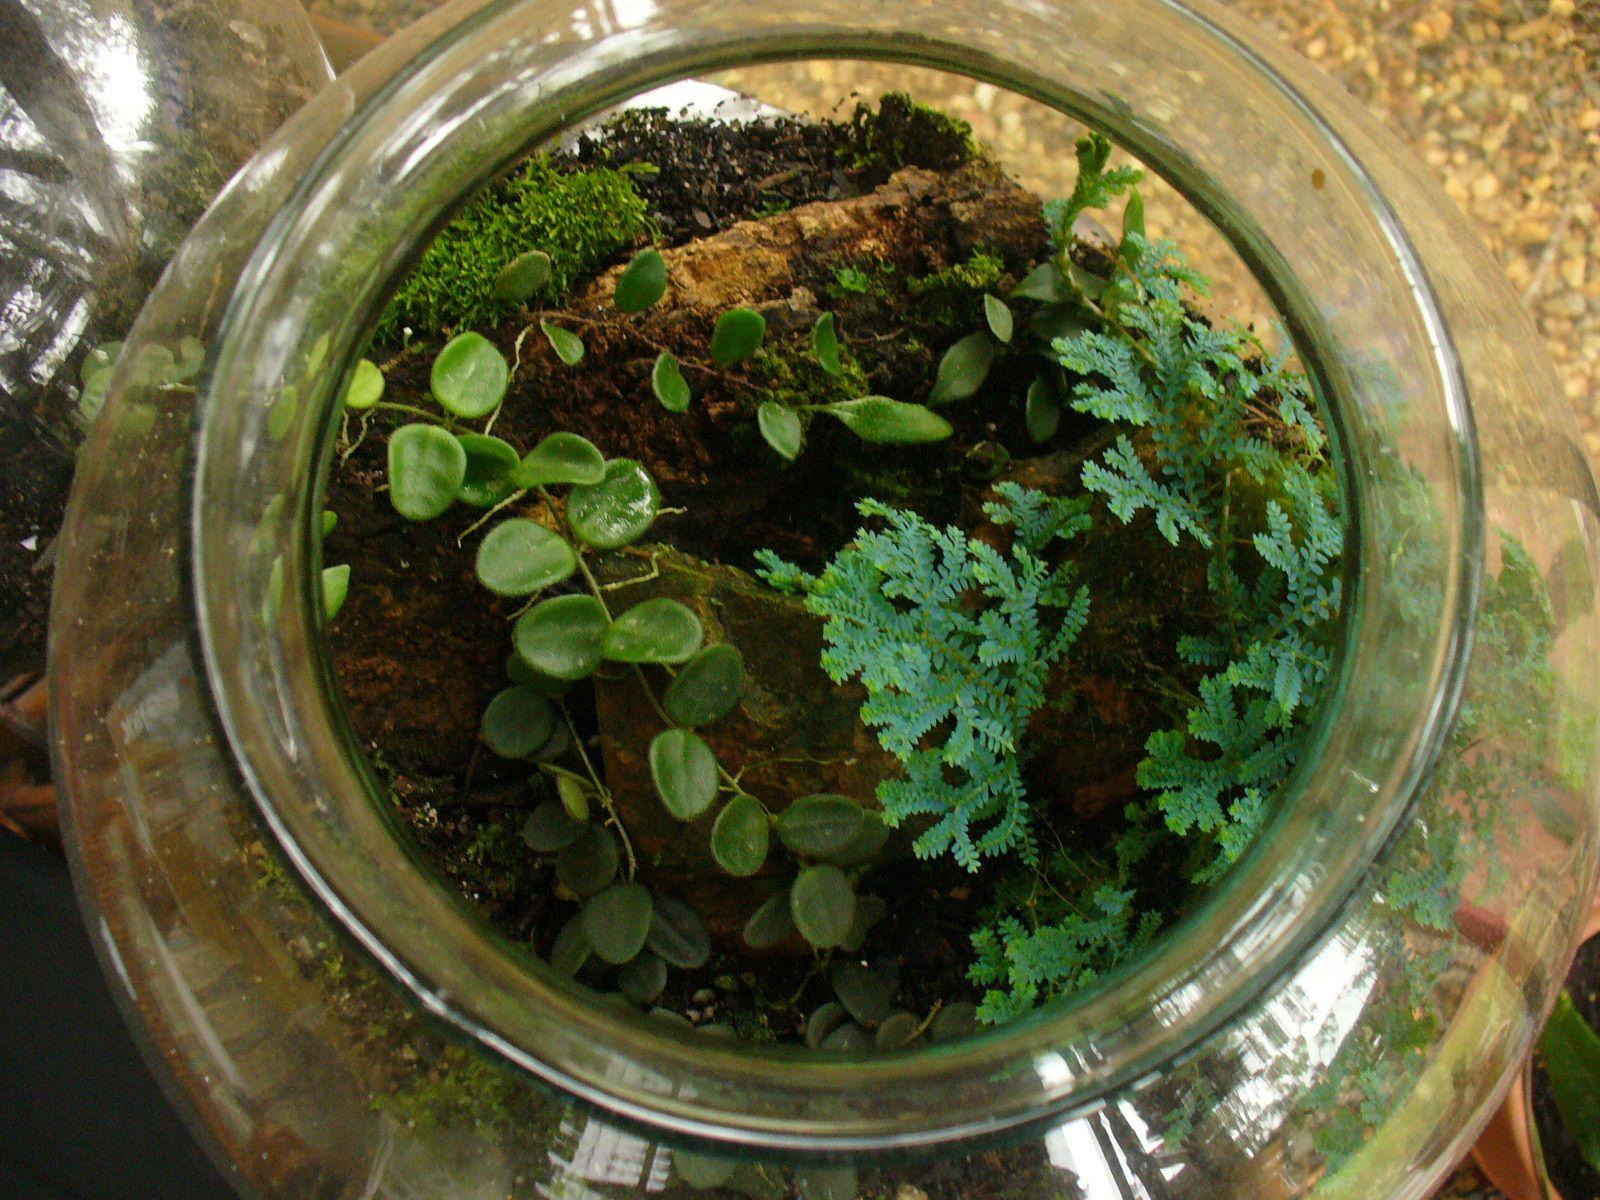 Hoya Serpens In A Terrarium Hoya Terrarium Decor Home Decor